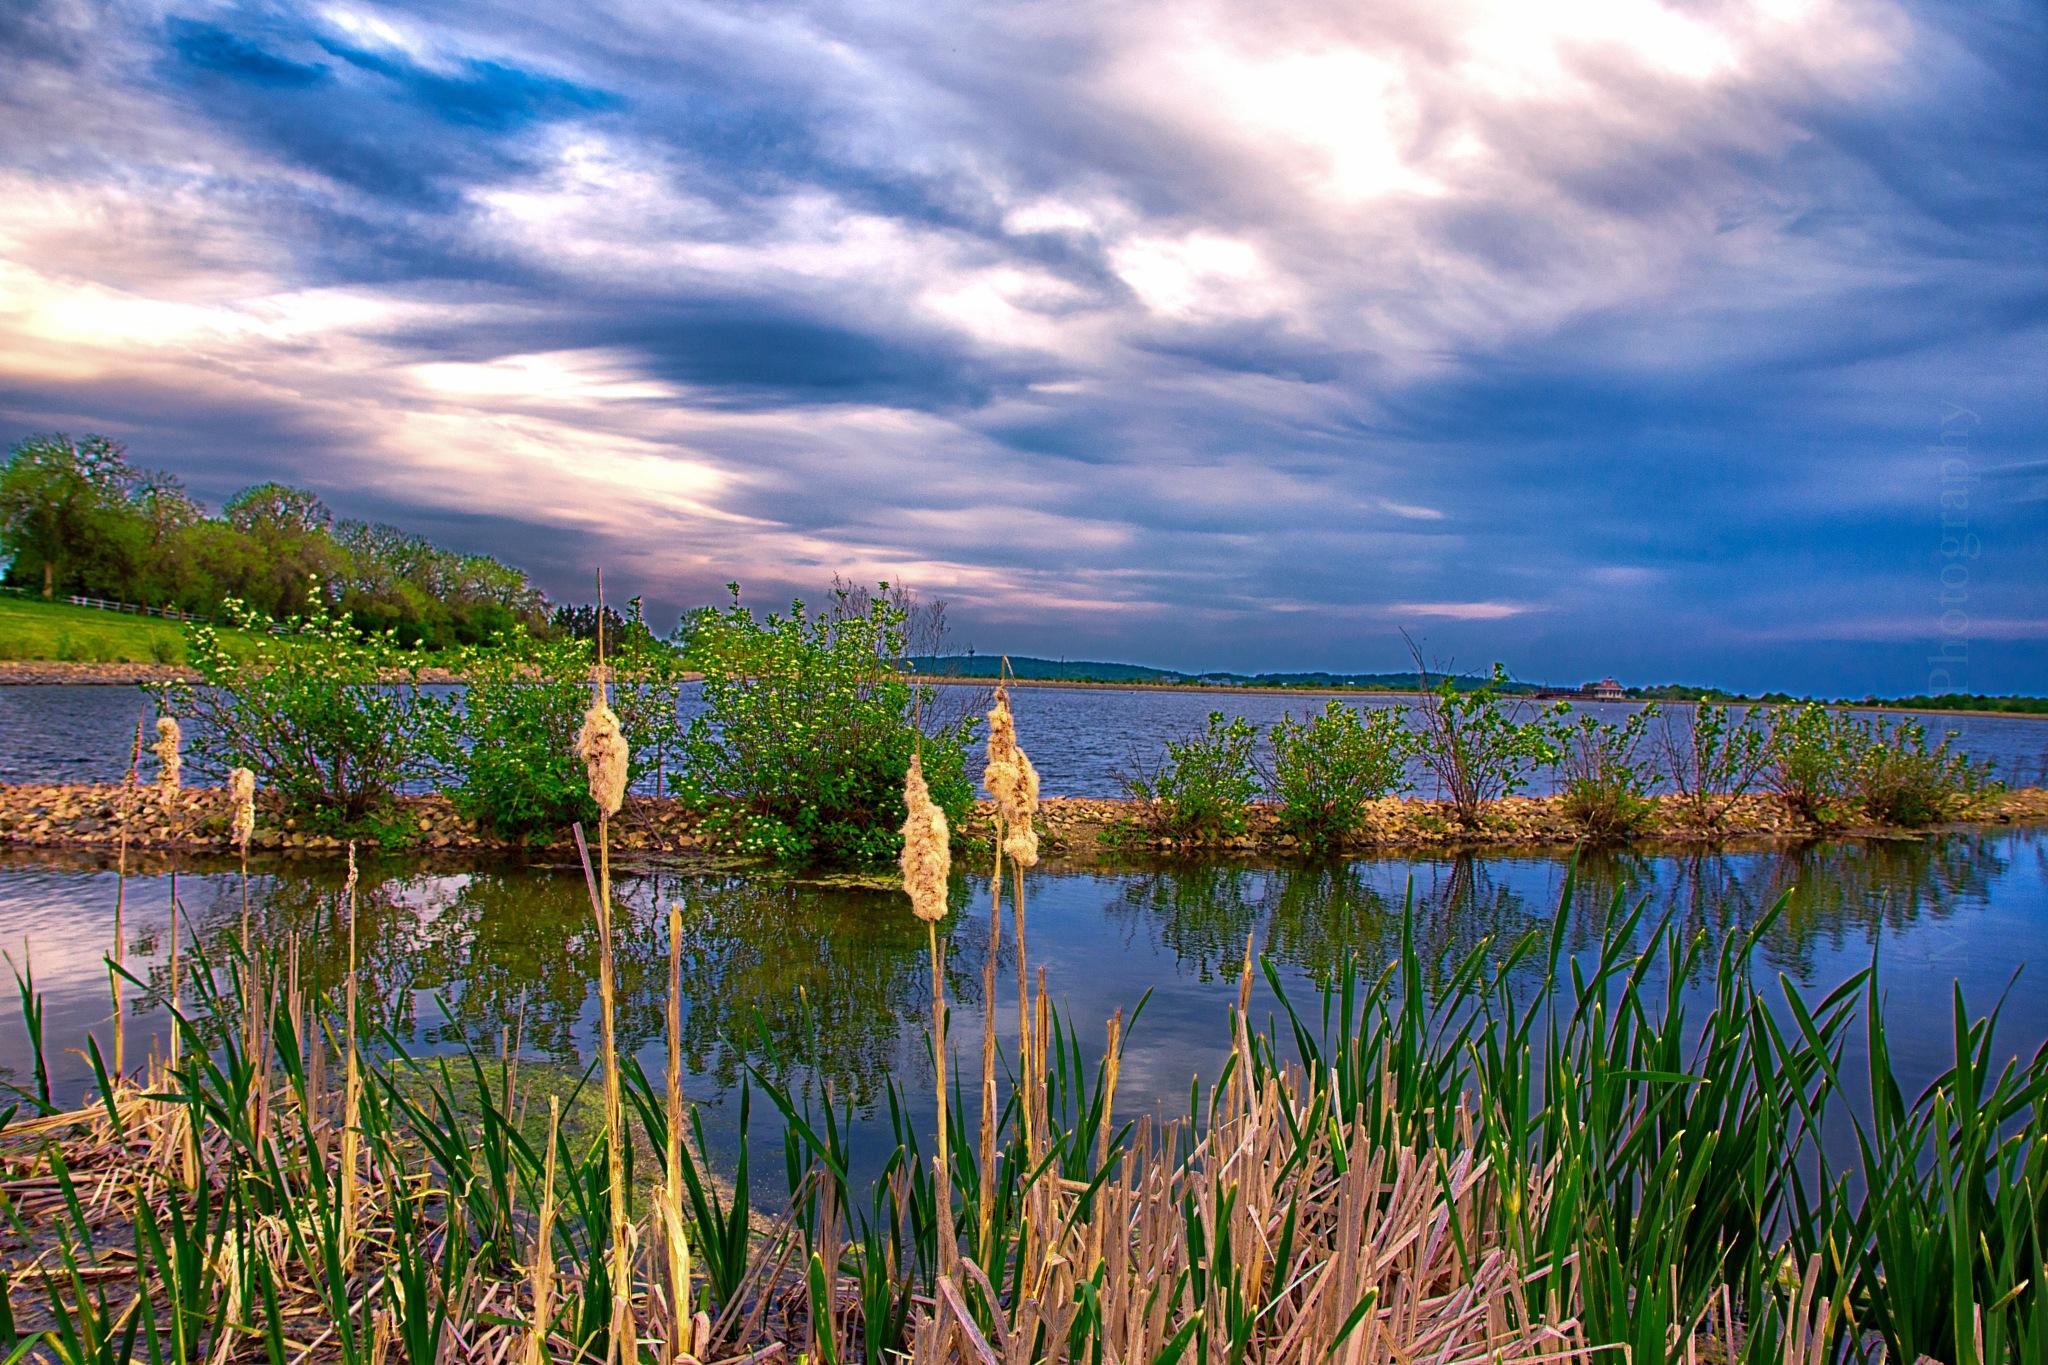 A Calm Spring Evening by mvmoorephotography